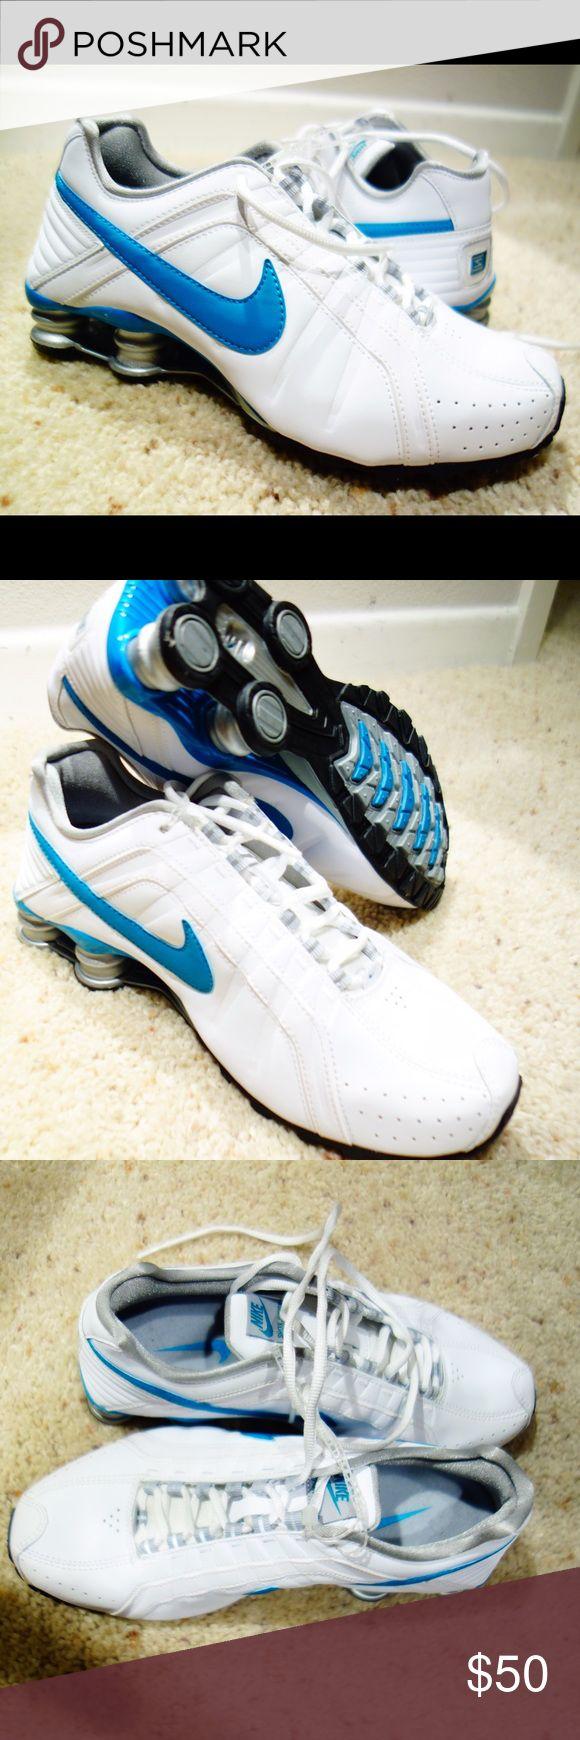 nike shox shoes nike athletic shoes